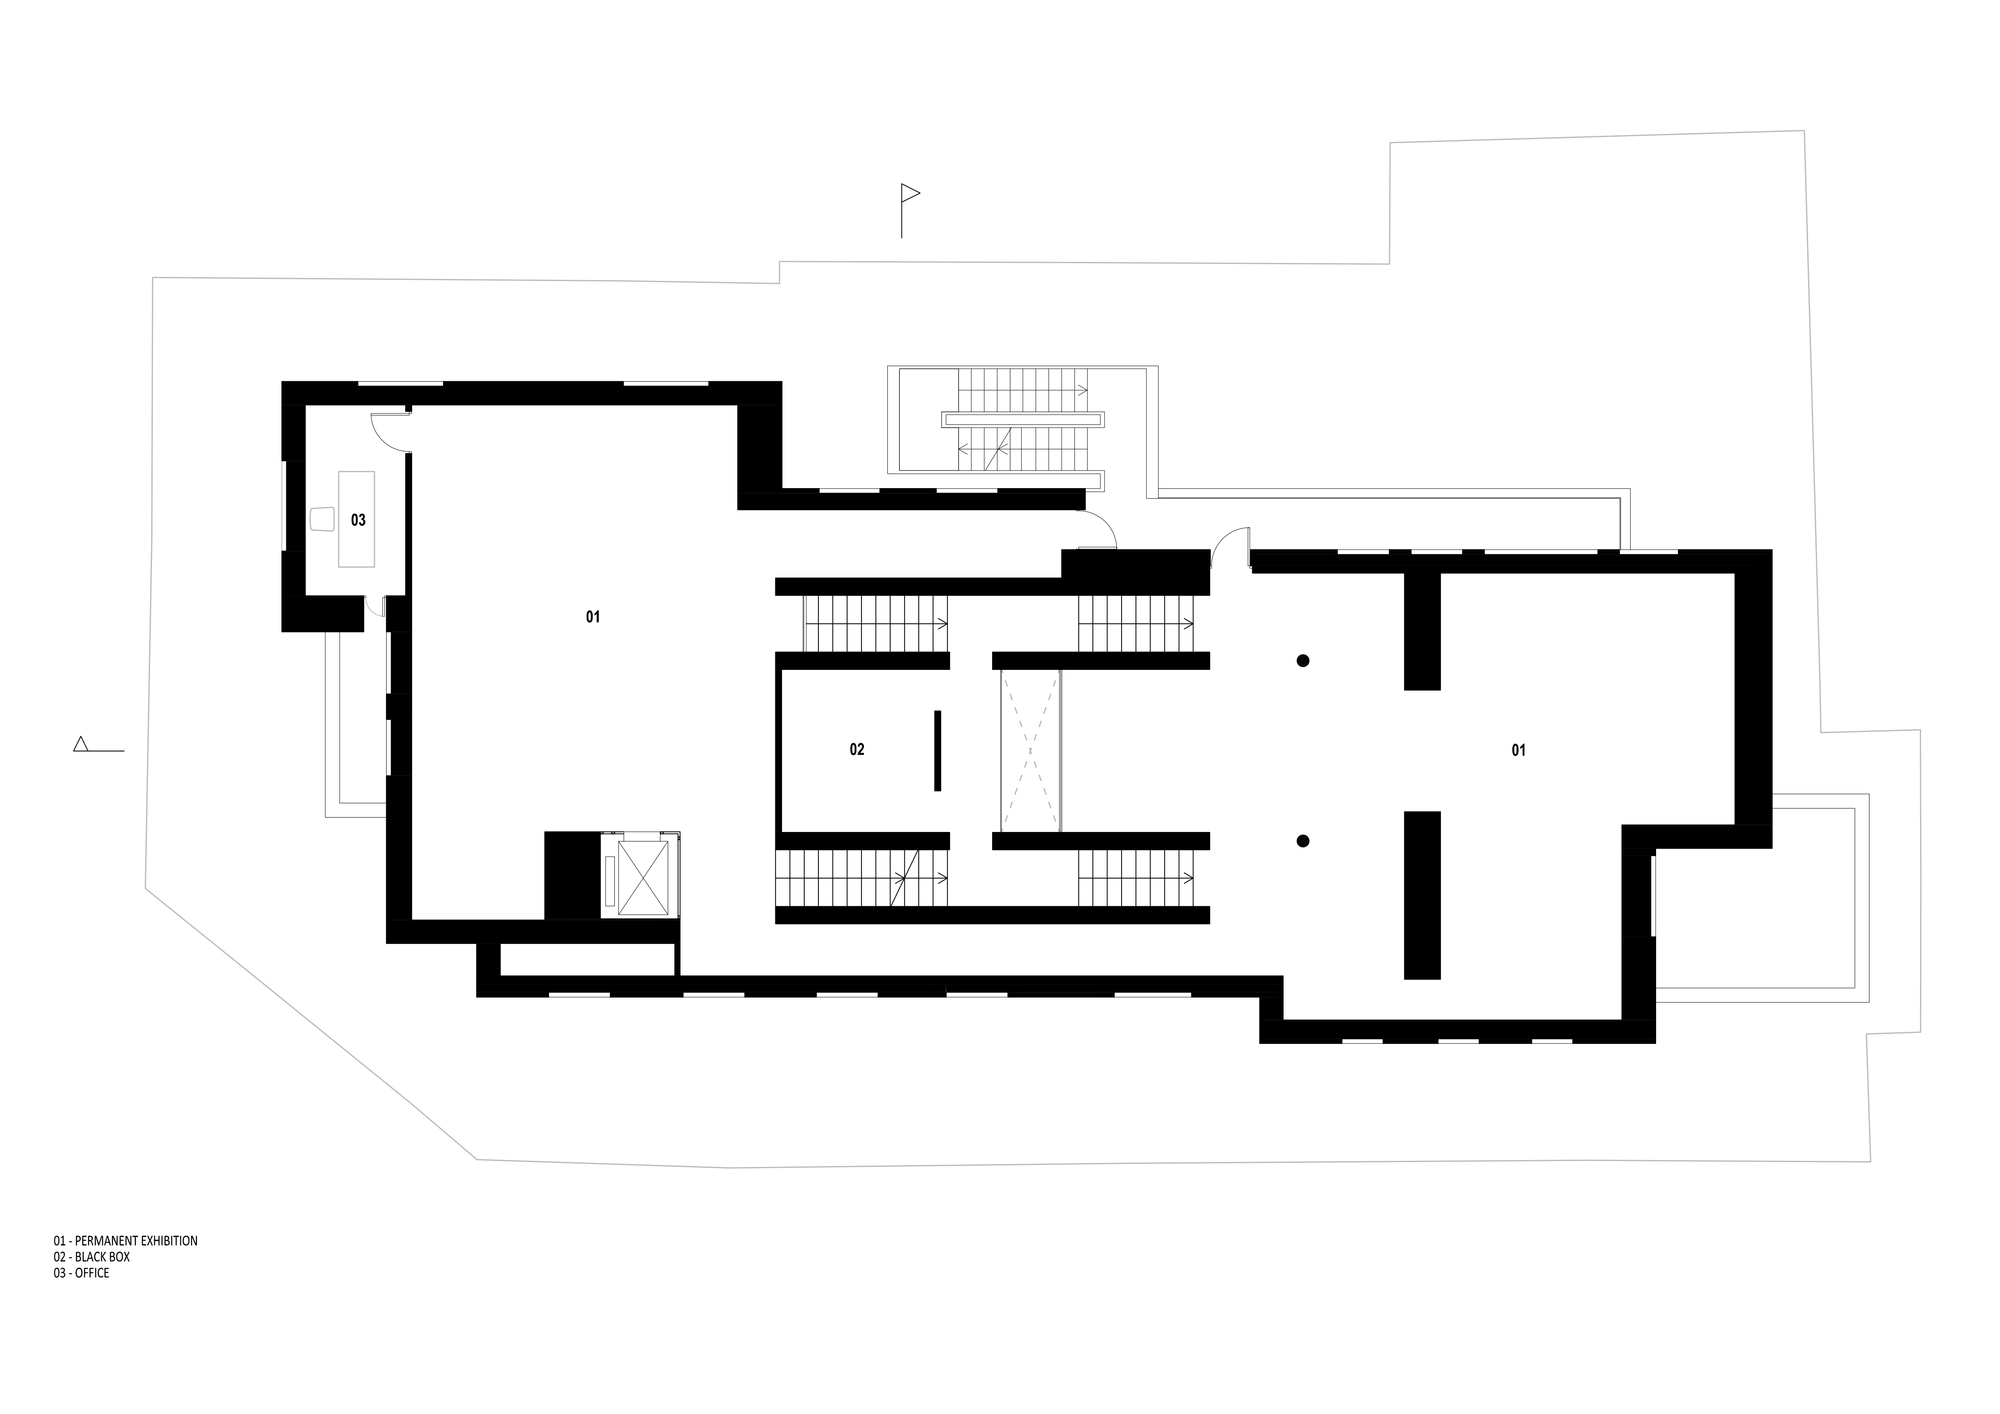 m4 _MARe_Museum_-_Plan_-_Second_Floor.jpg